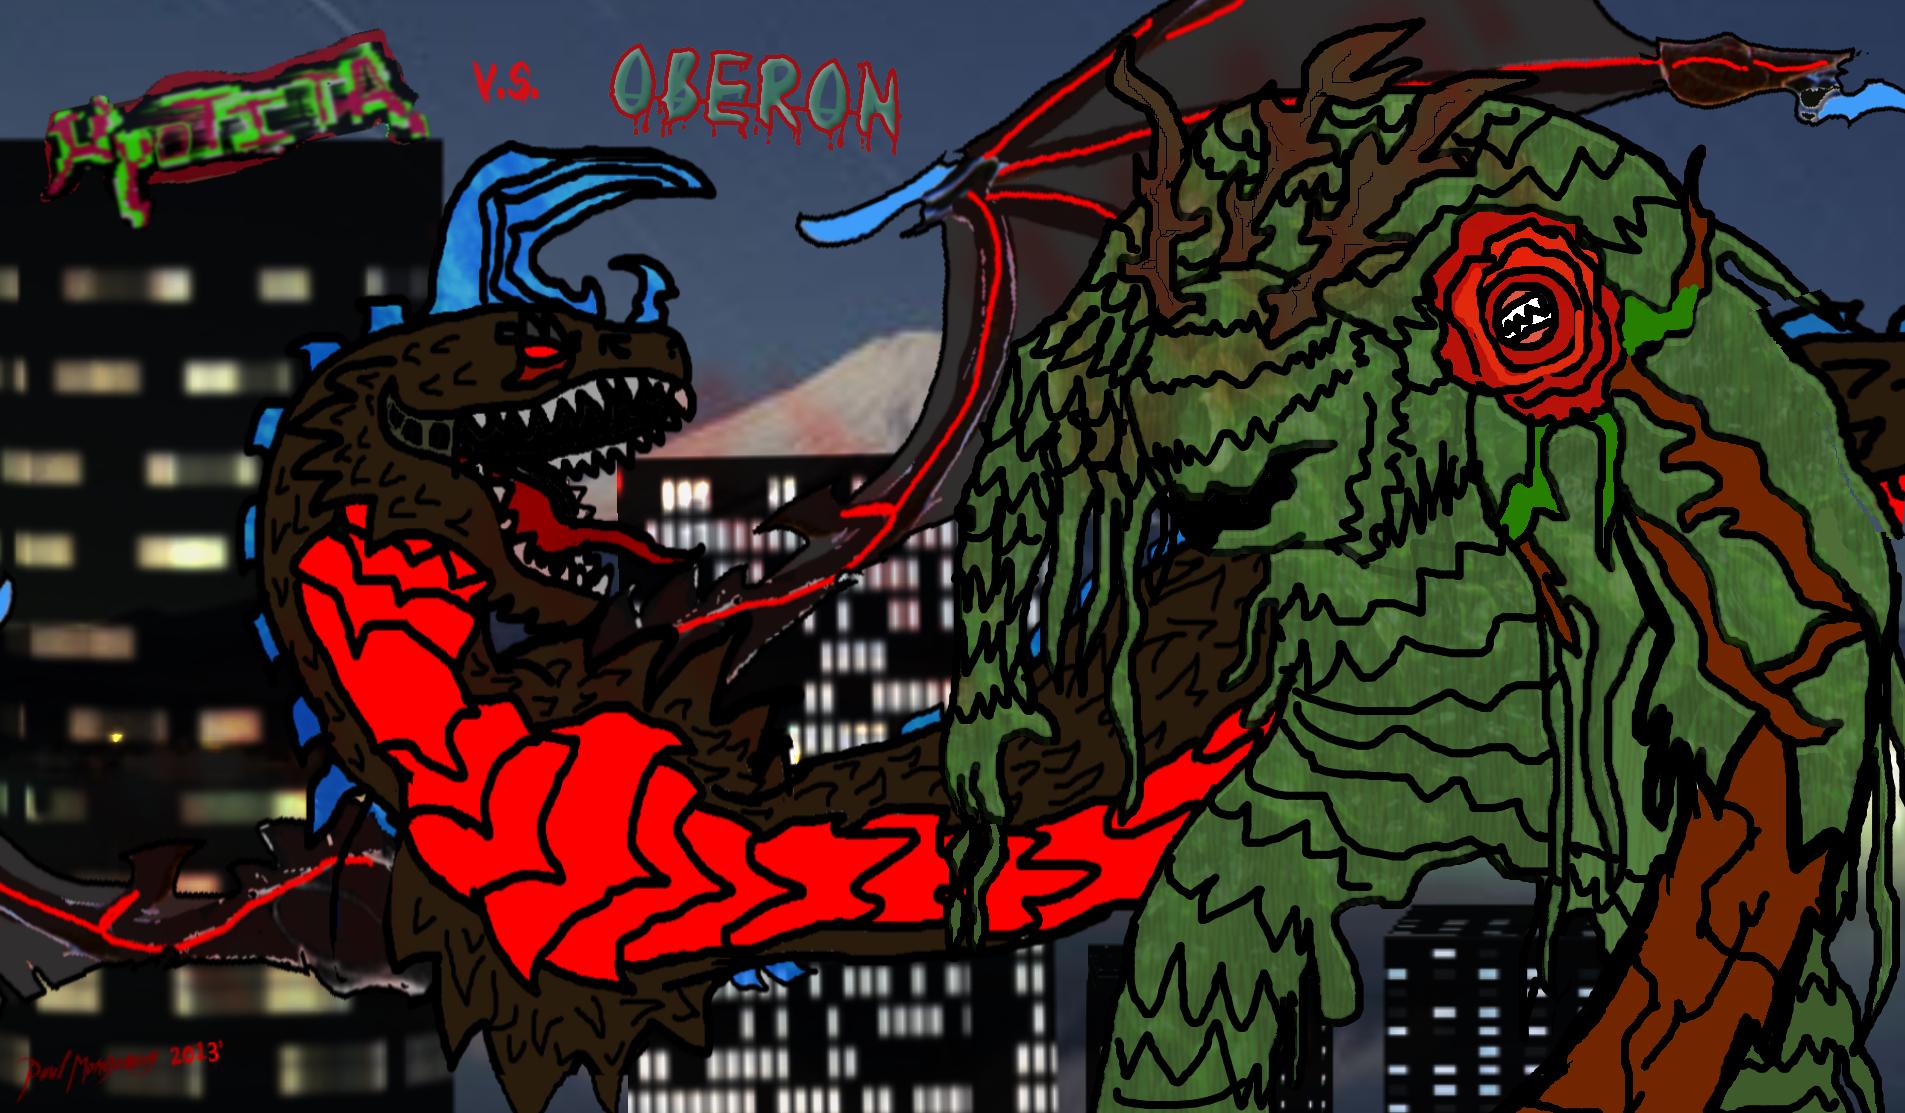 Kyo vs Oberon by Kyotita